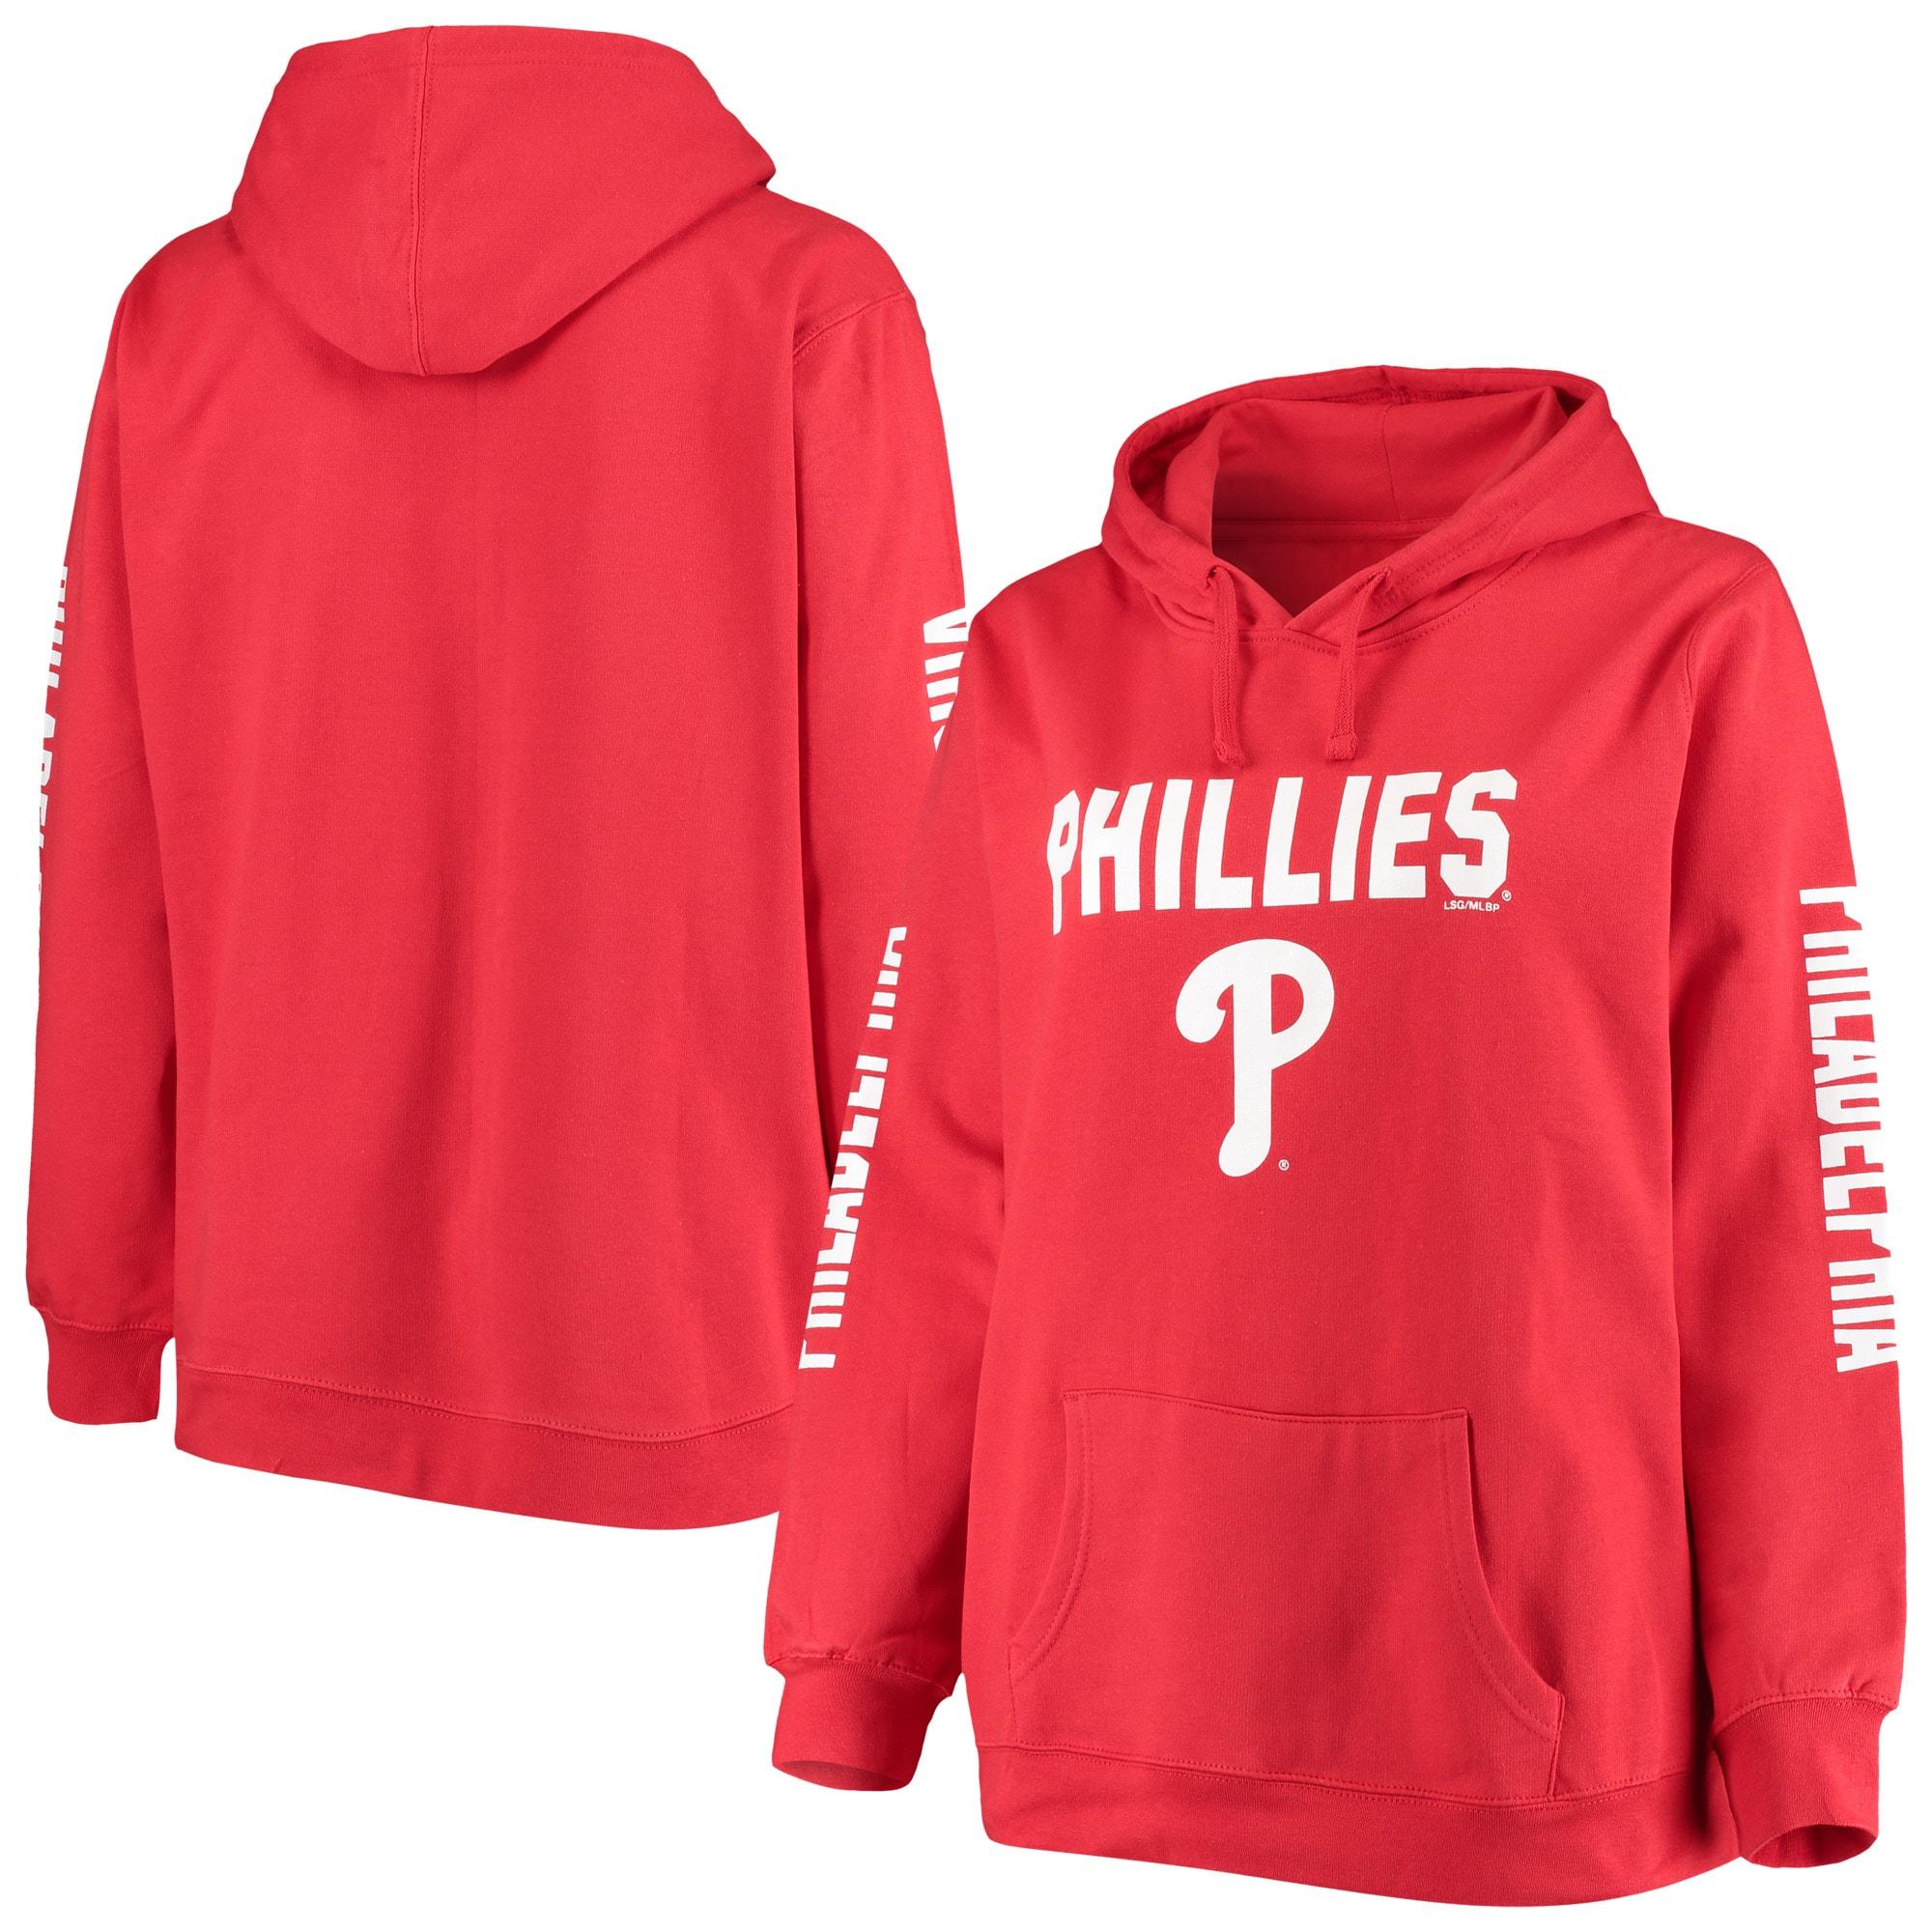 Philadelphia Phillies Women's Plus Size 4-Hit Pullover Hoodie - Red